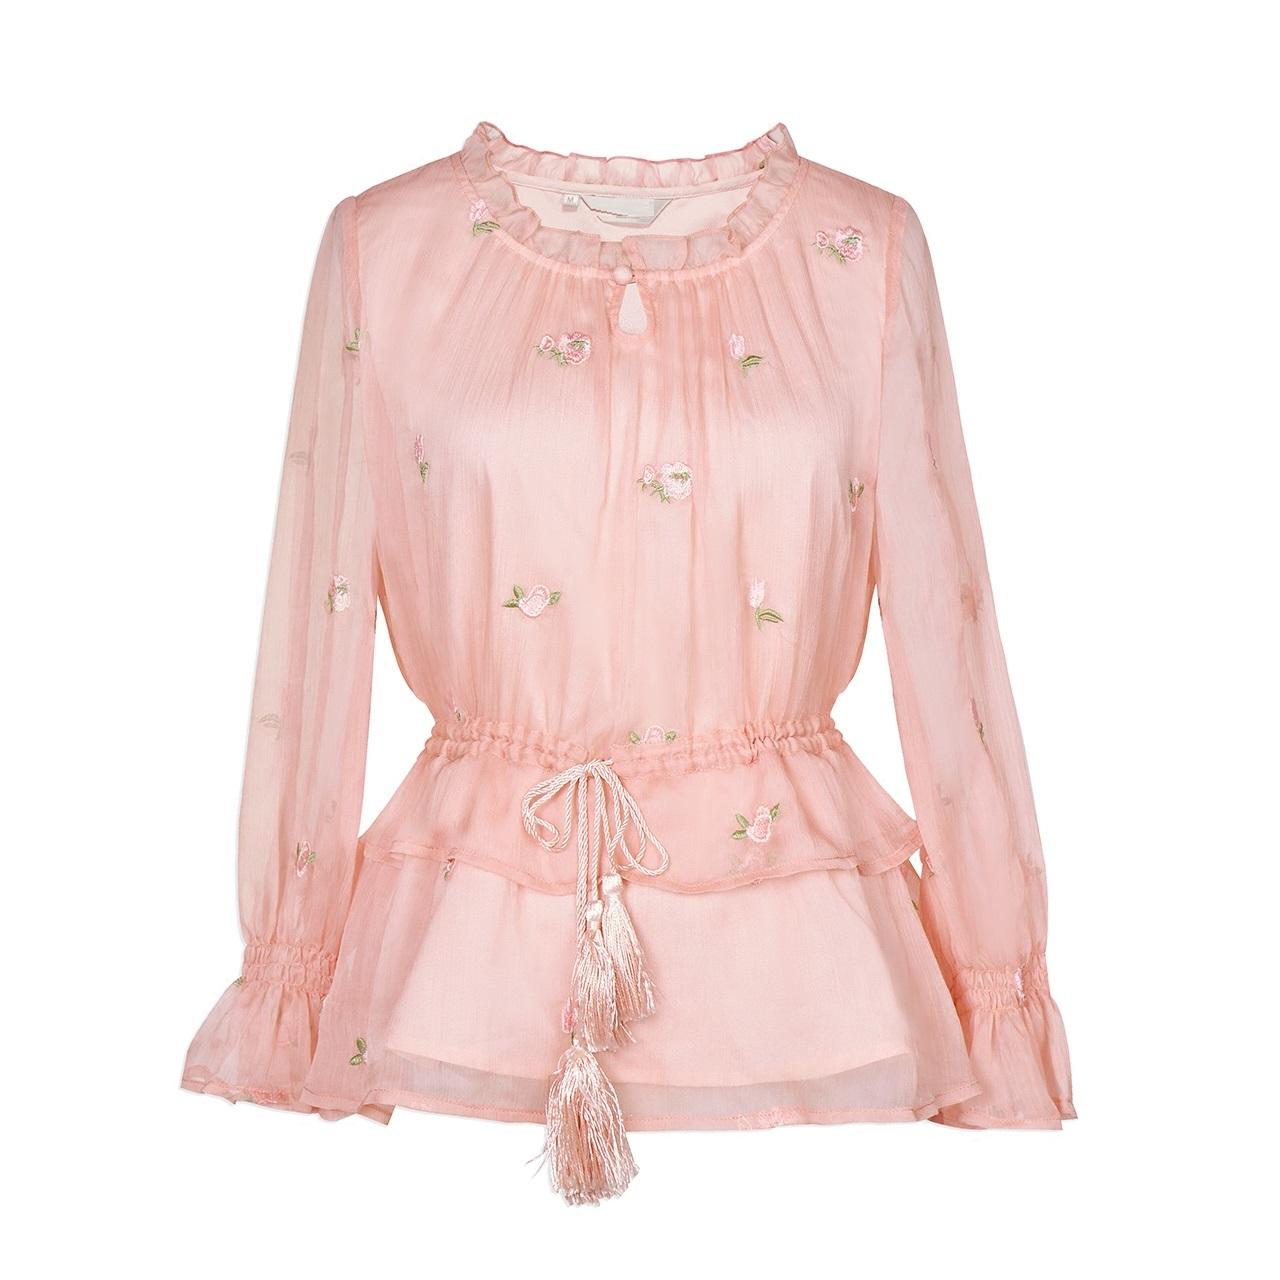 why2018新款女装春装收腰显瘦百搭绣花长袖雪纺衬衫